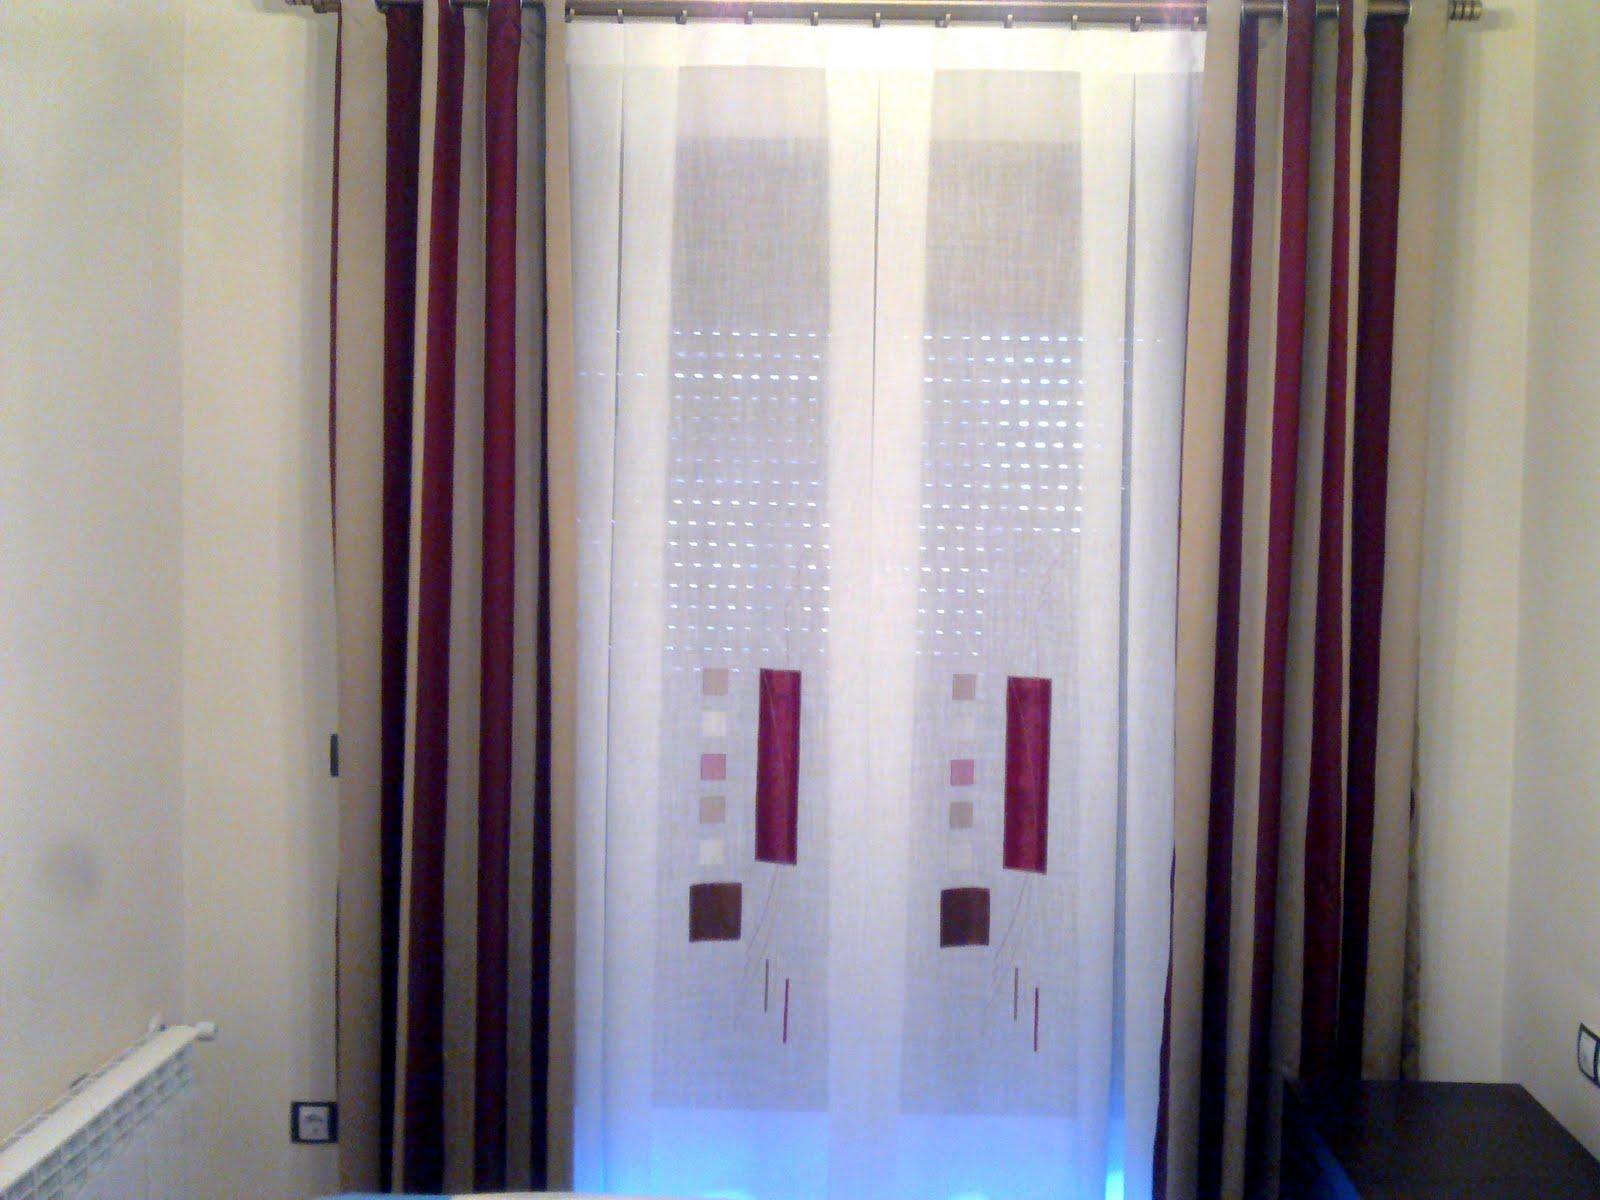 Cortinas para dormitorios modernas cortinas roller for Cortinas dormitorio modernas